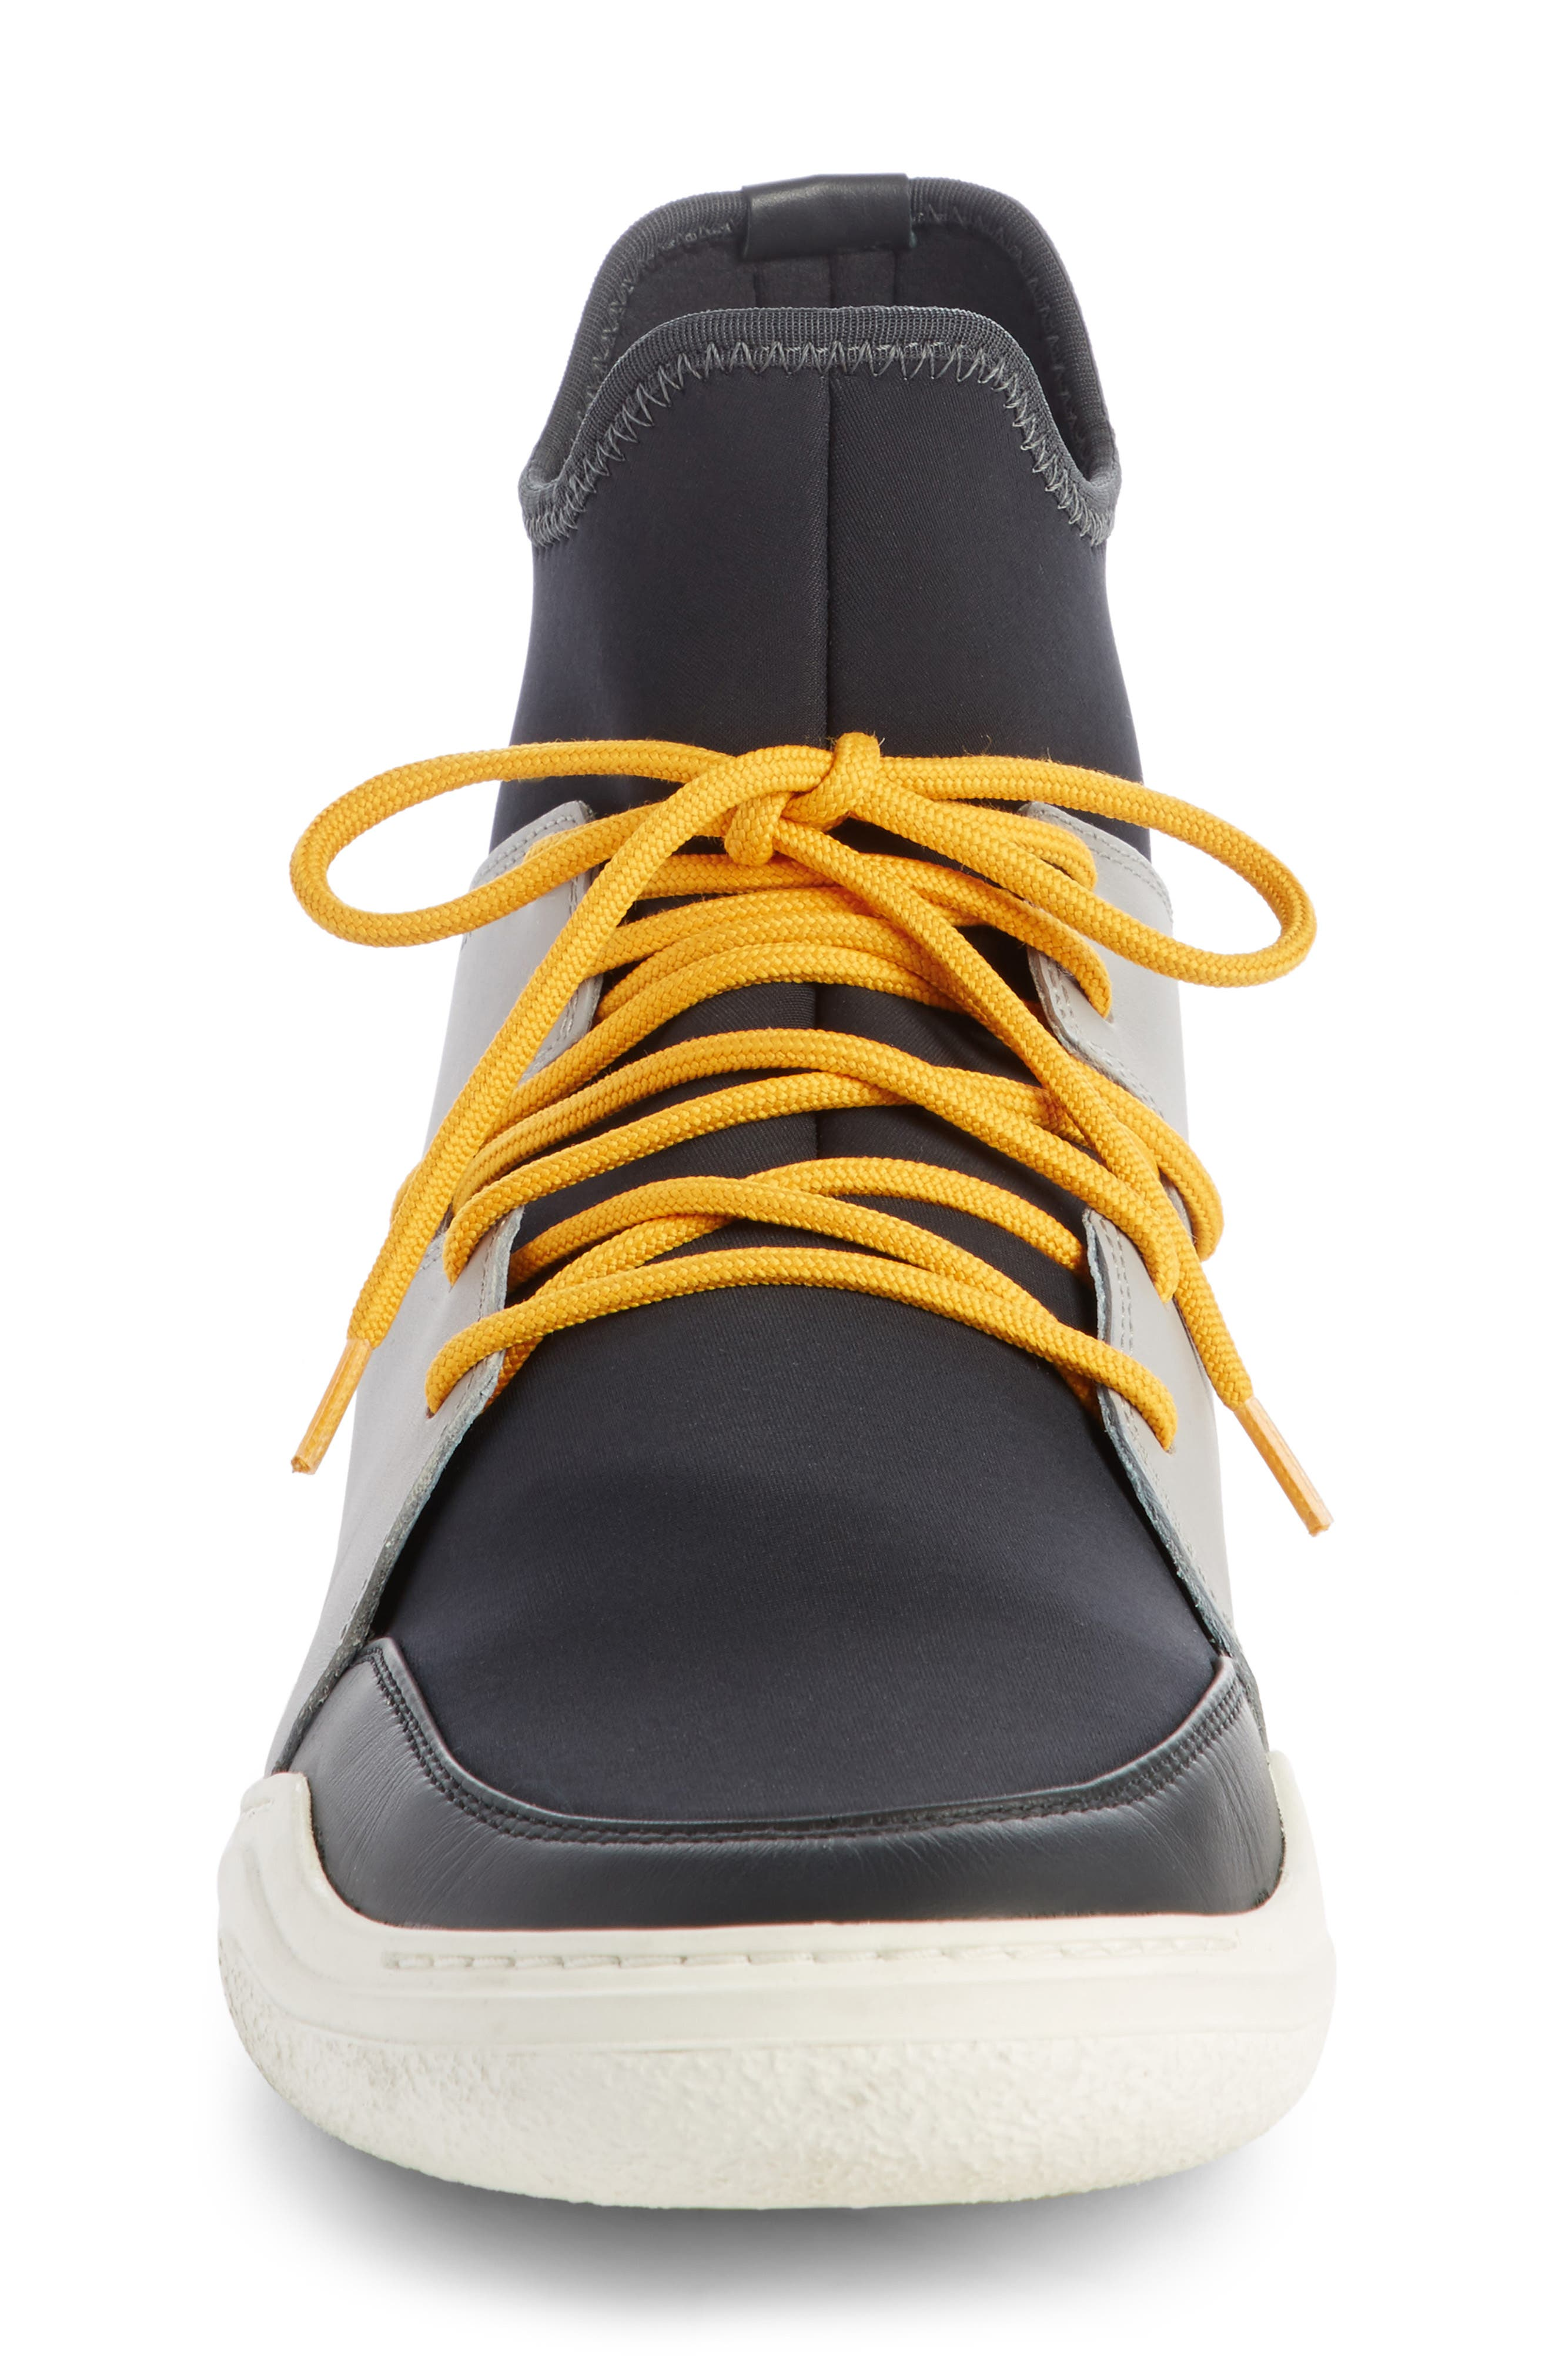 High Top Sneaker,                             Alternate thumbnail 3, color,                             001